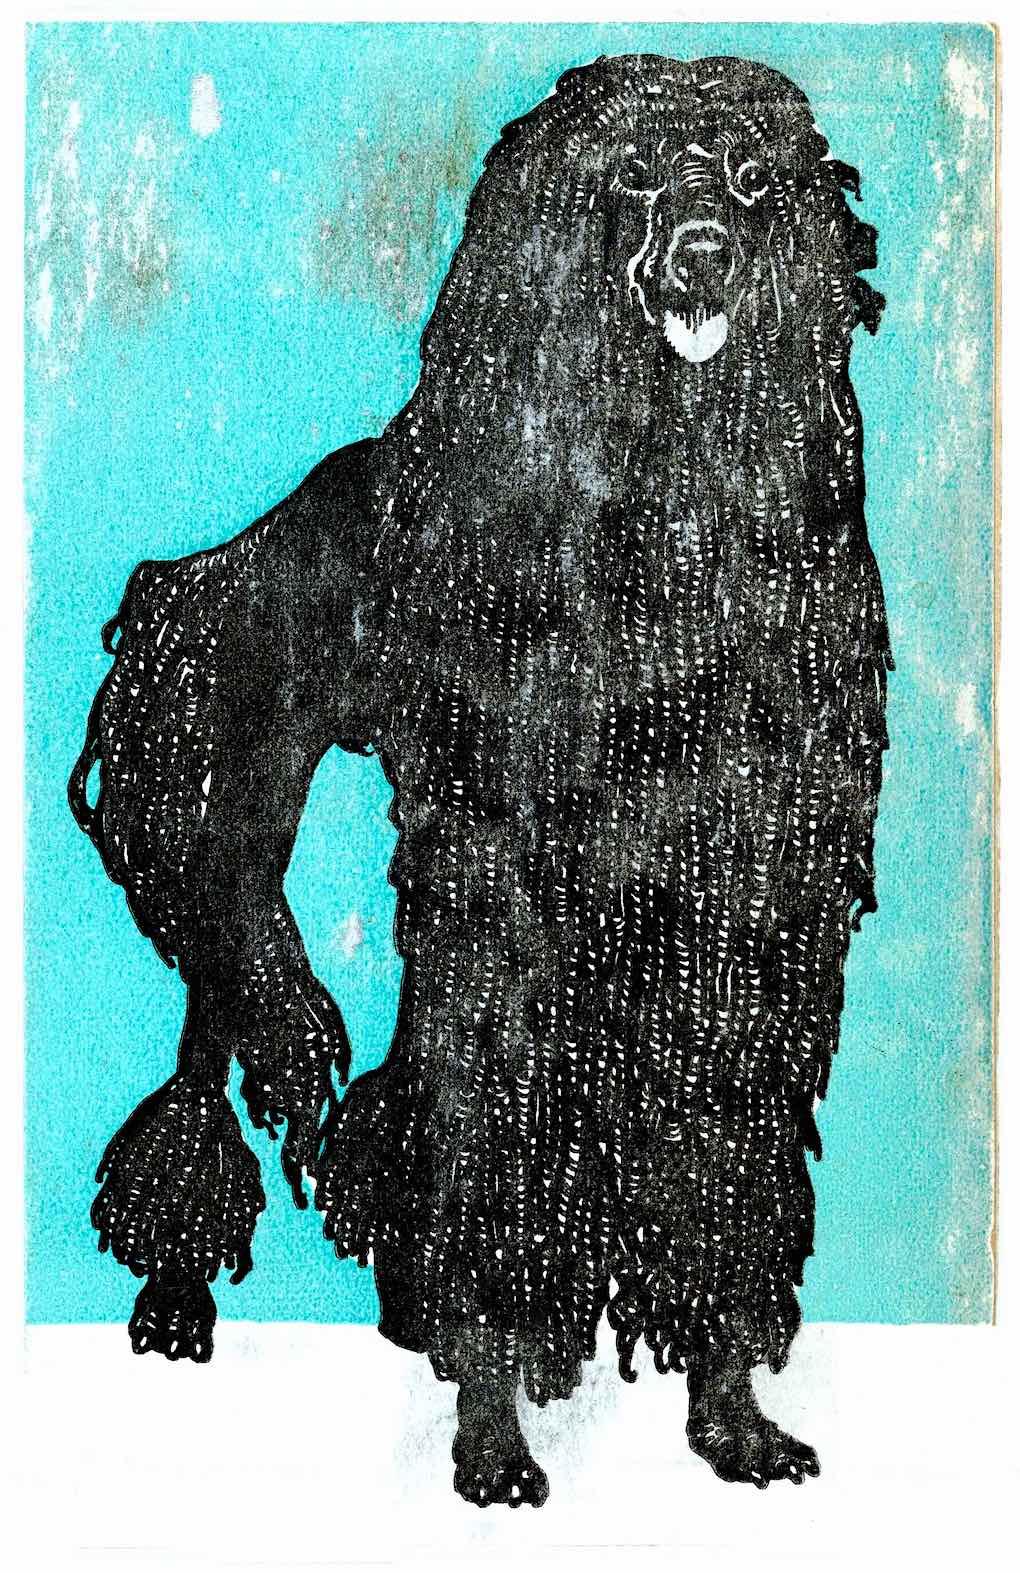 a 1912 Wiener Werkstätte postcard, a long haired black dog